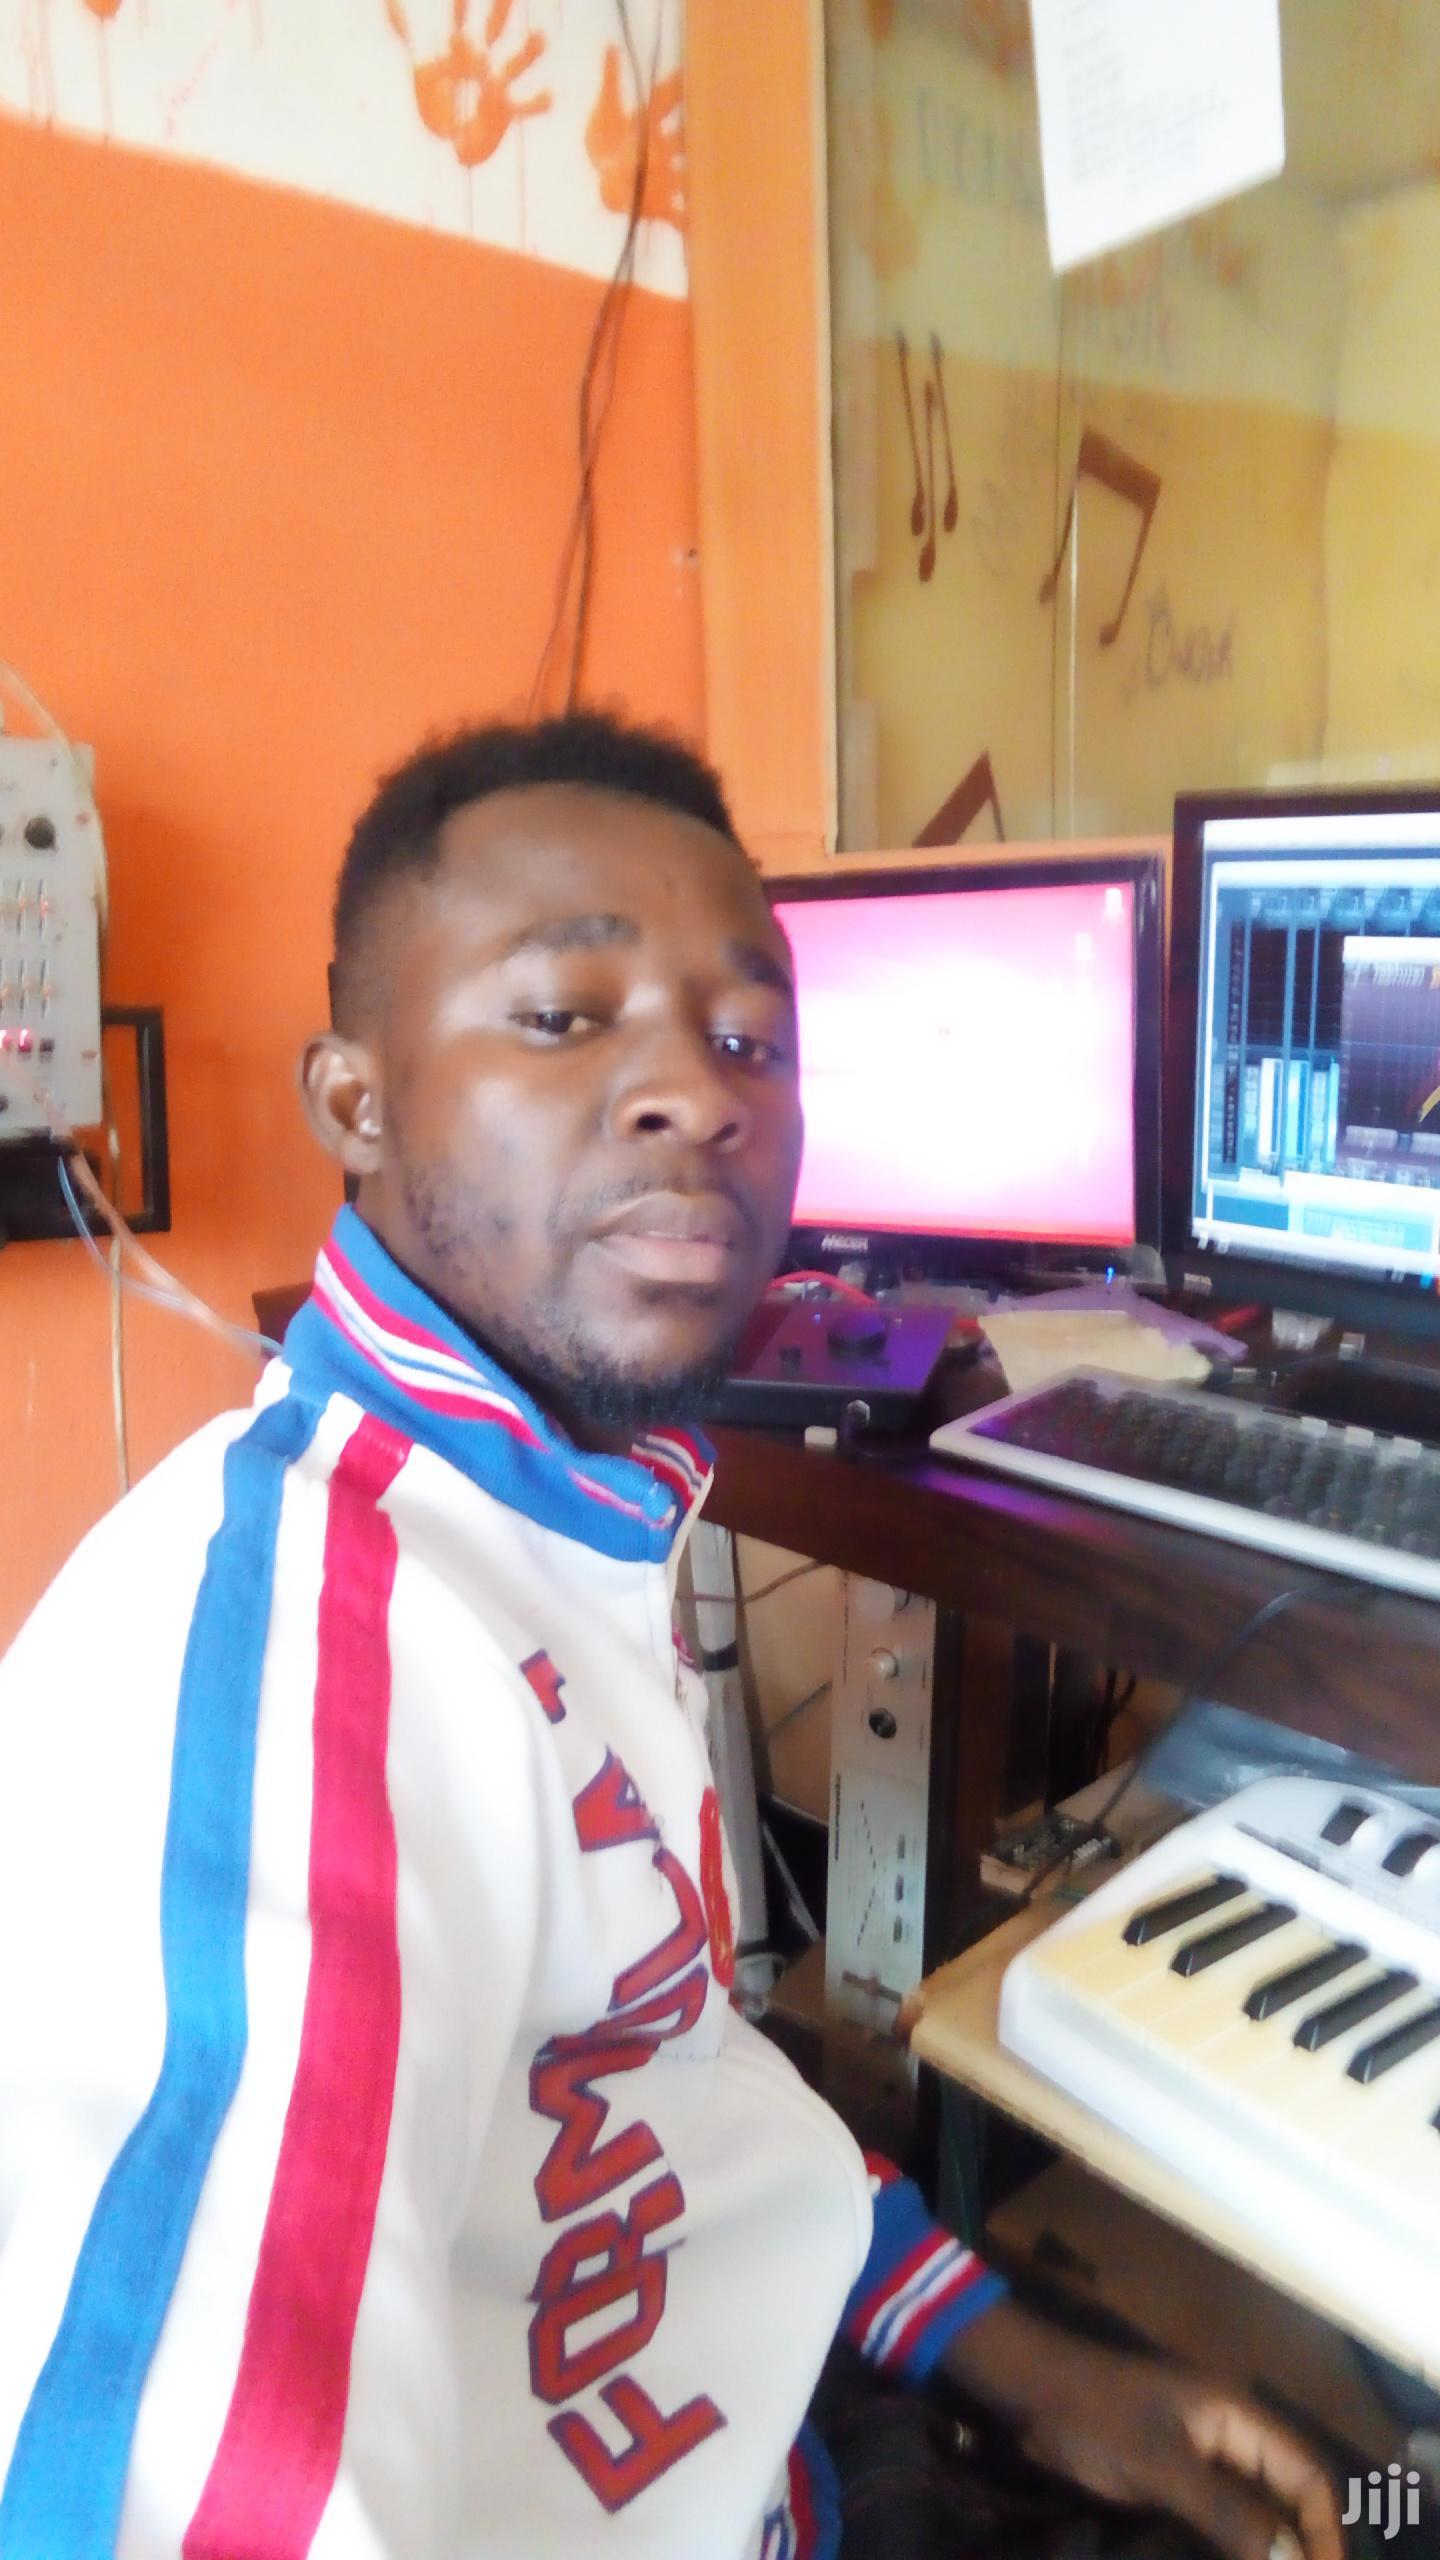 Archive: Polarbeatzgh Music Recording Studio